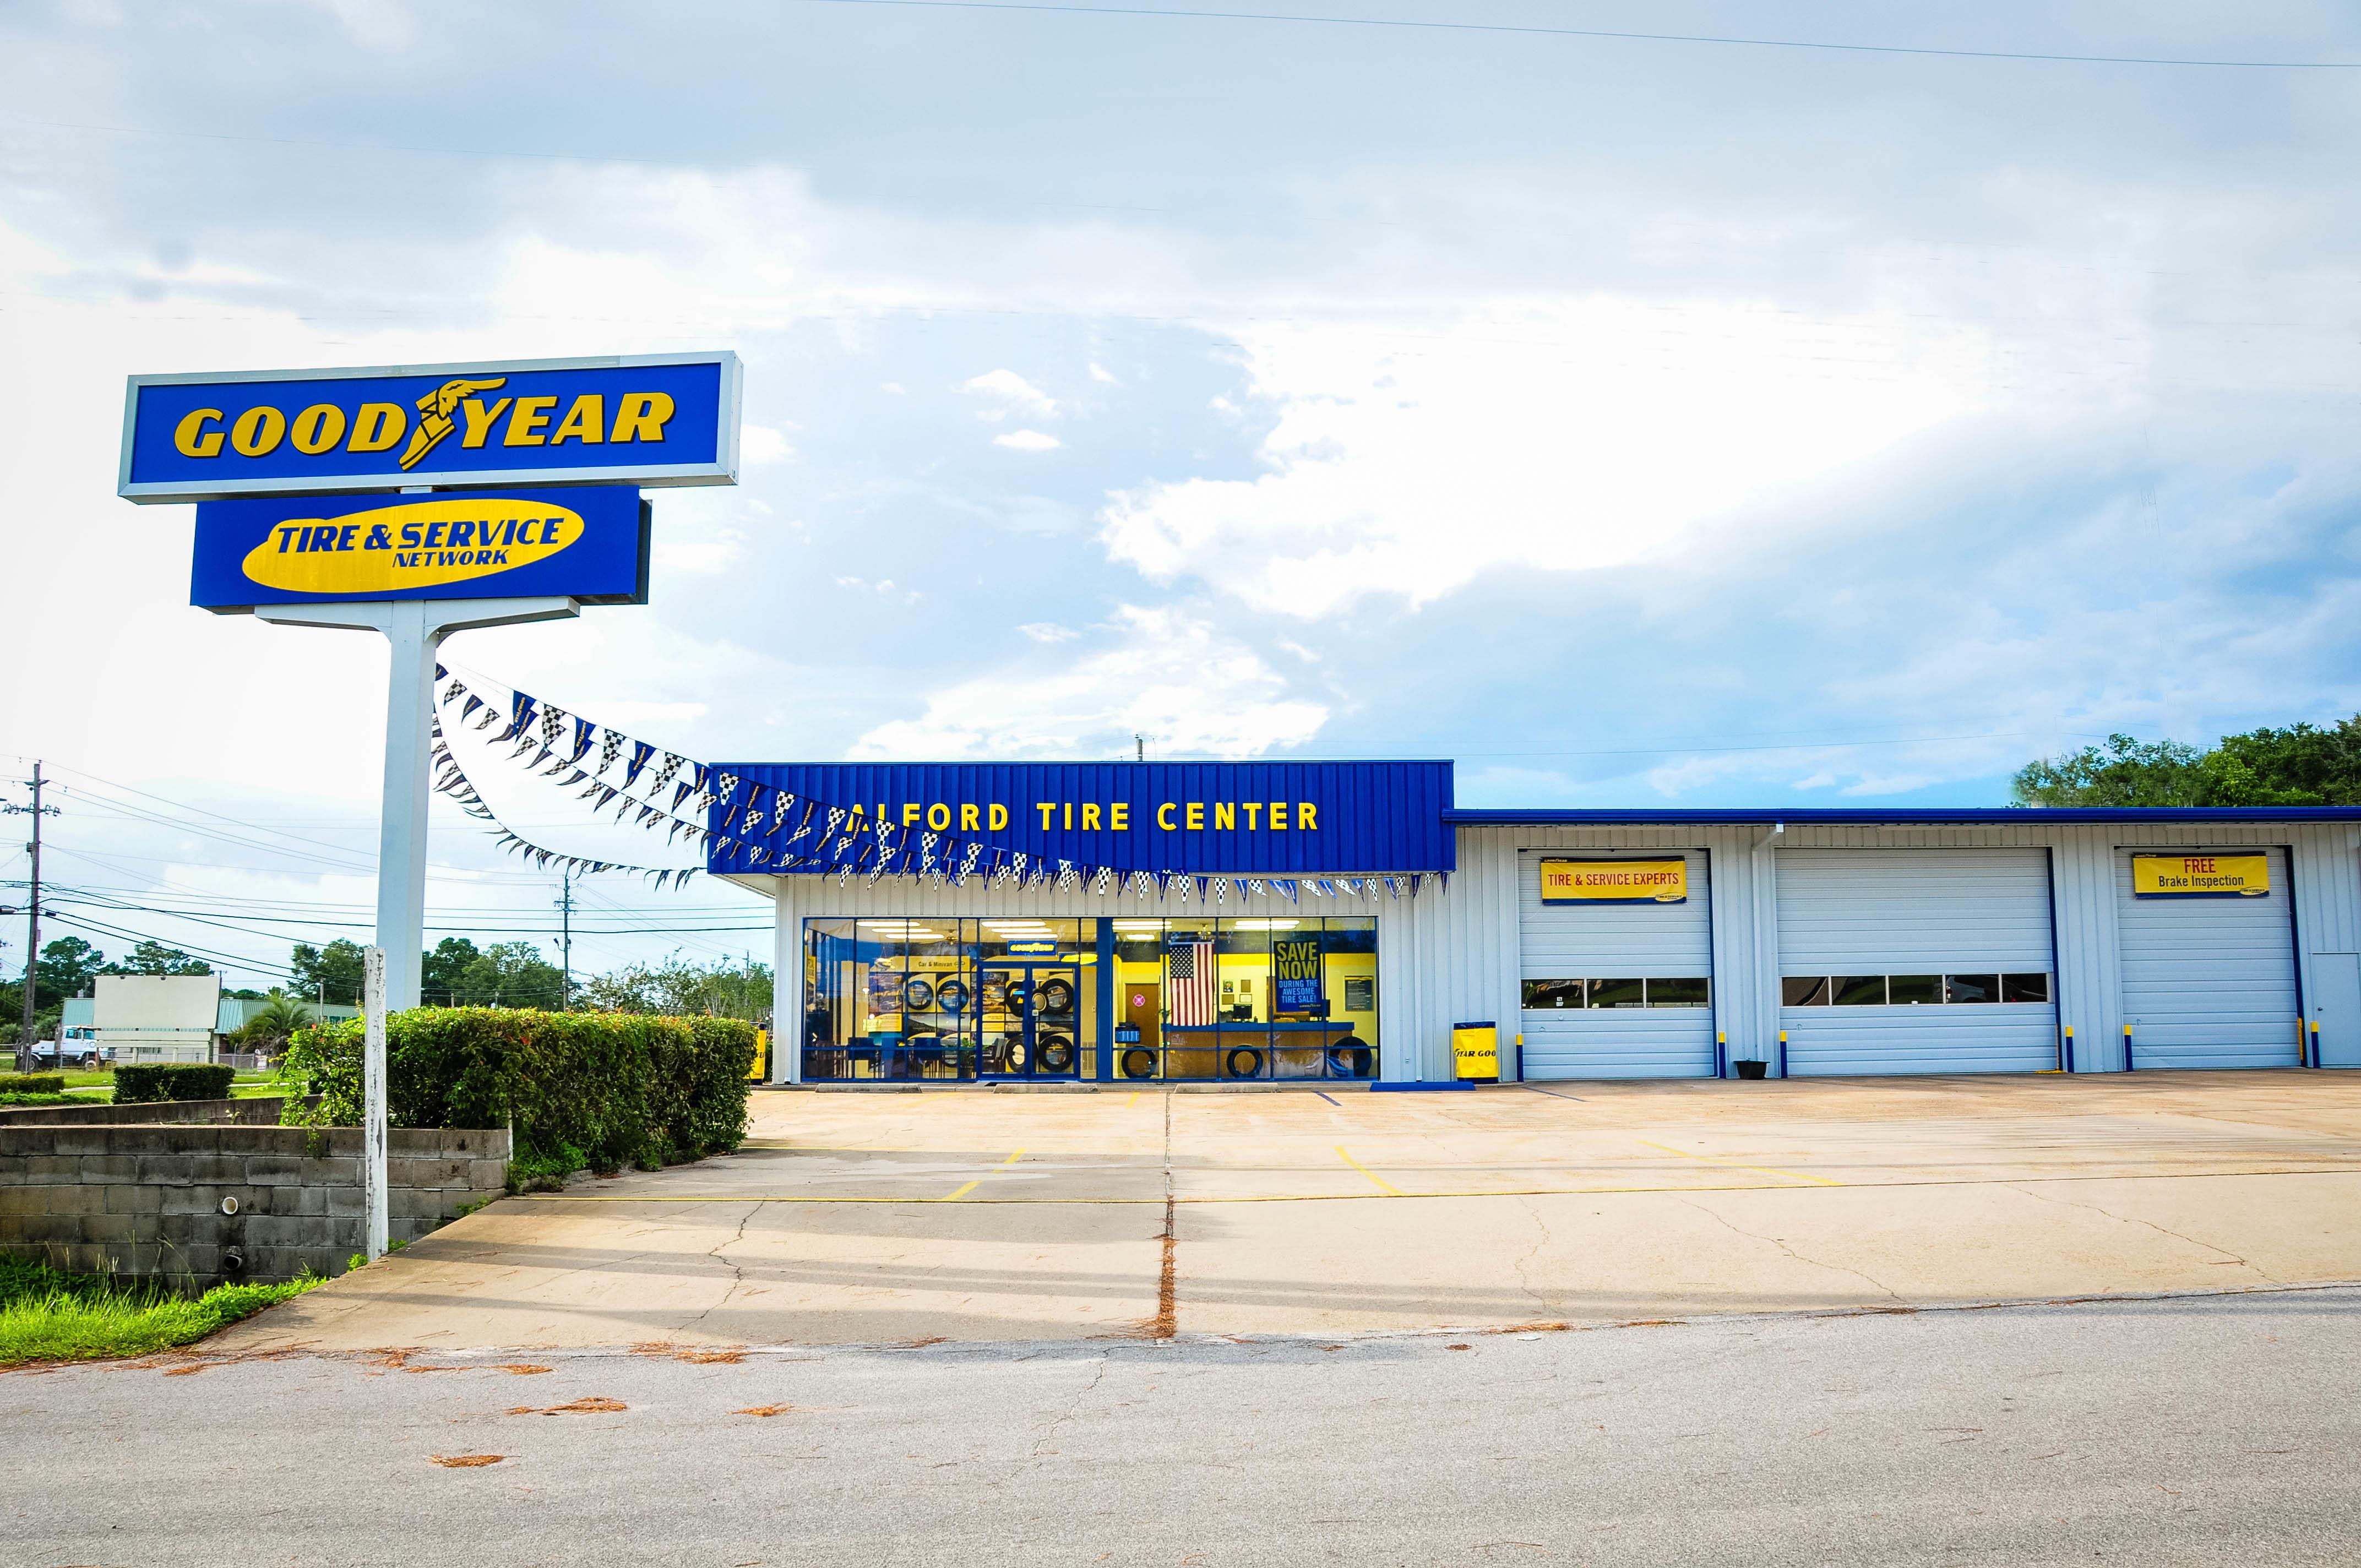 Alford tire center in panama city fl 32404 for Parkway motors in panama city florida